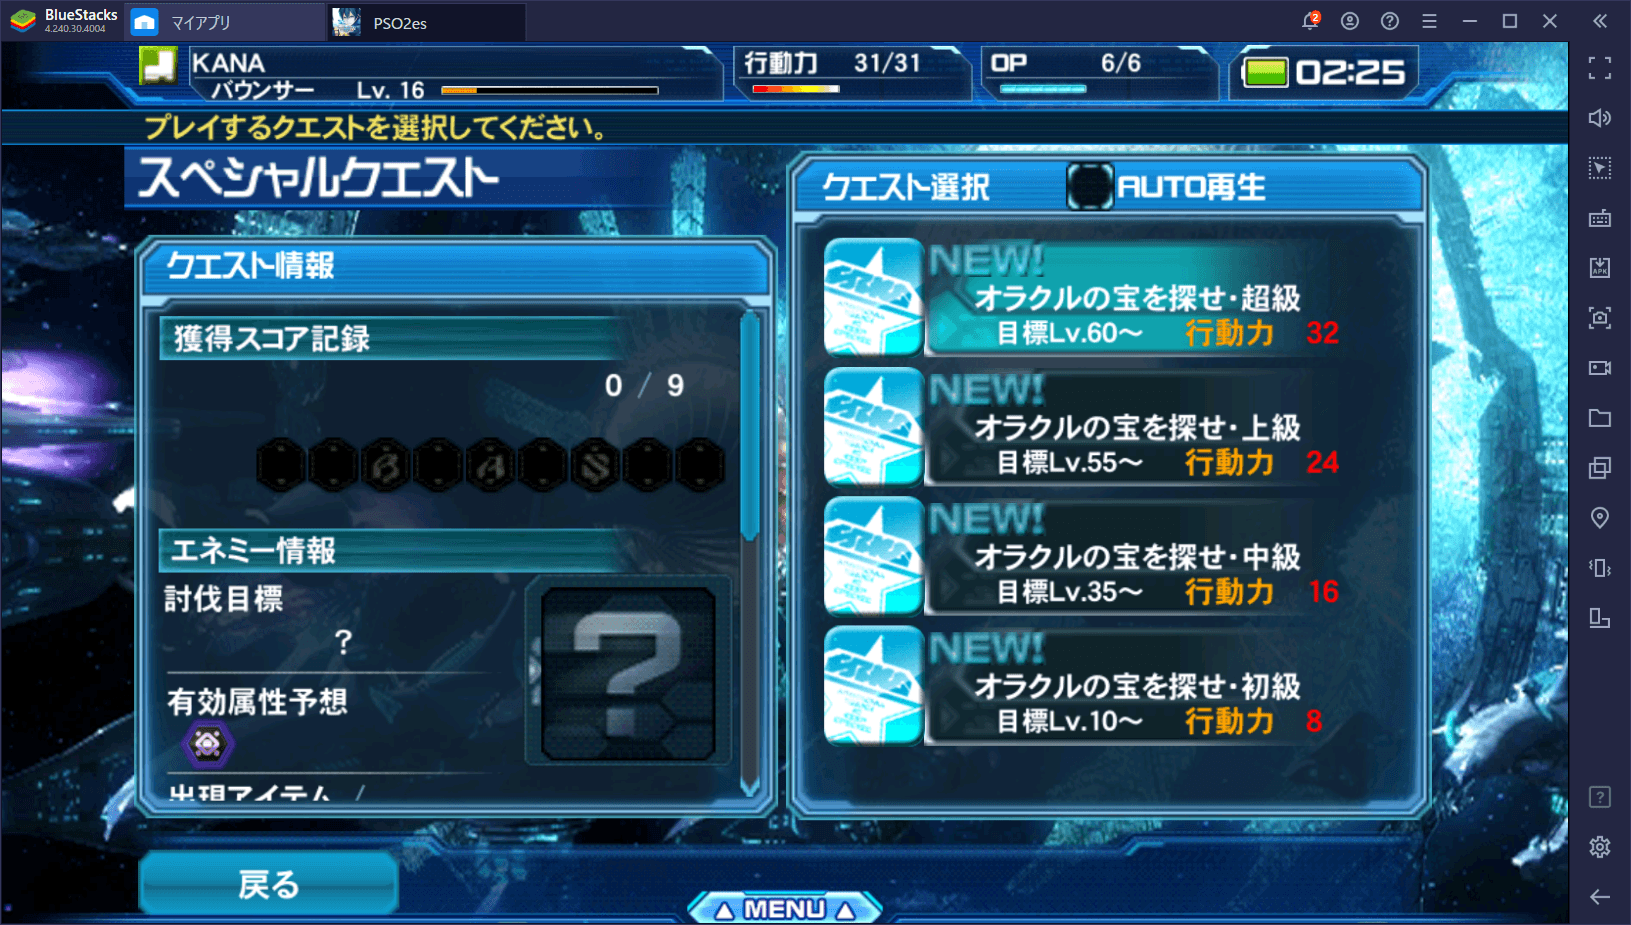 BlueStacks:『ファンタシースターオンライン2 es』初心者向け攻略ガイド